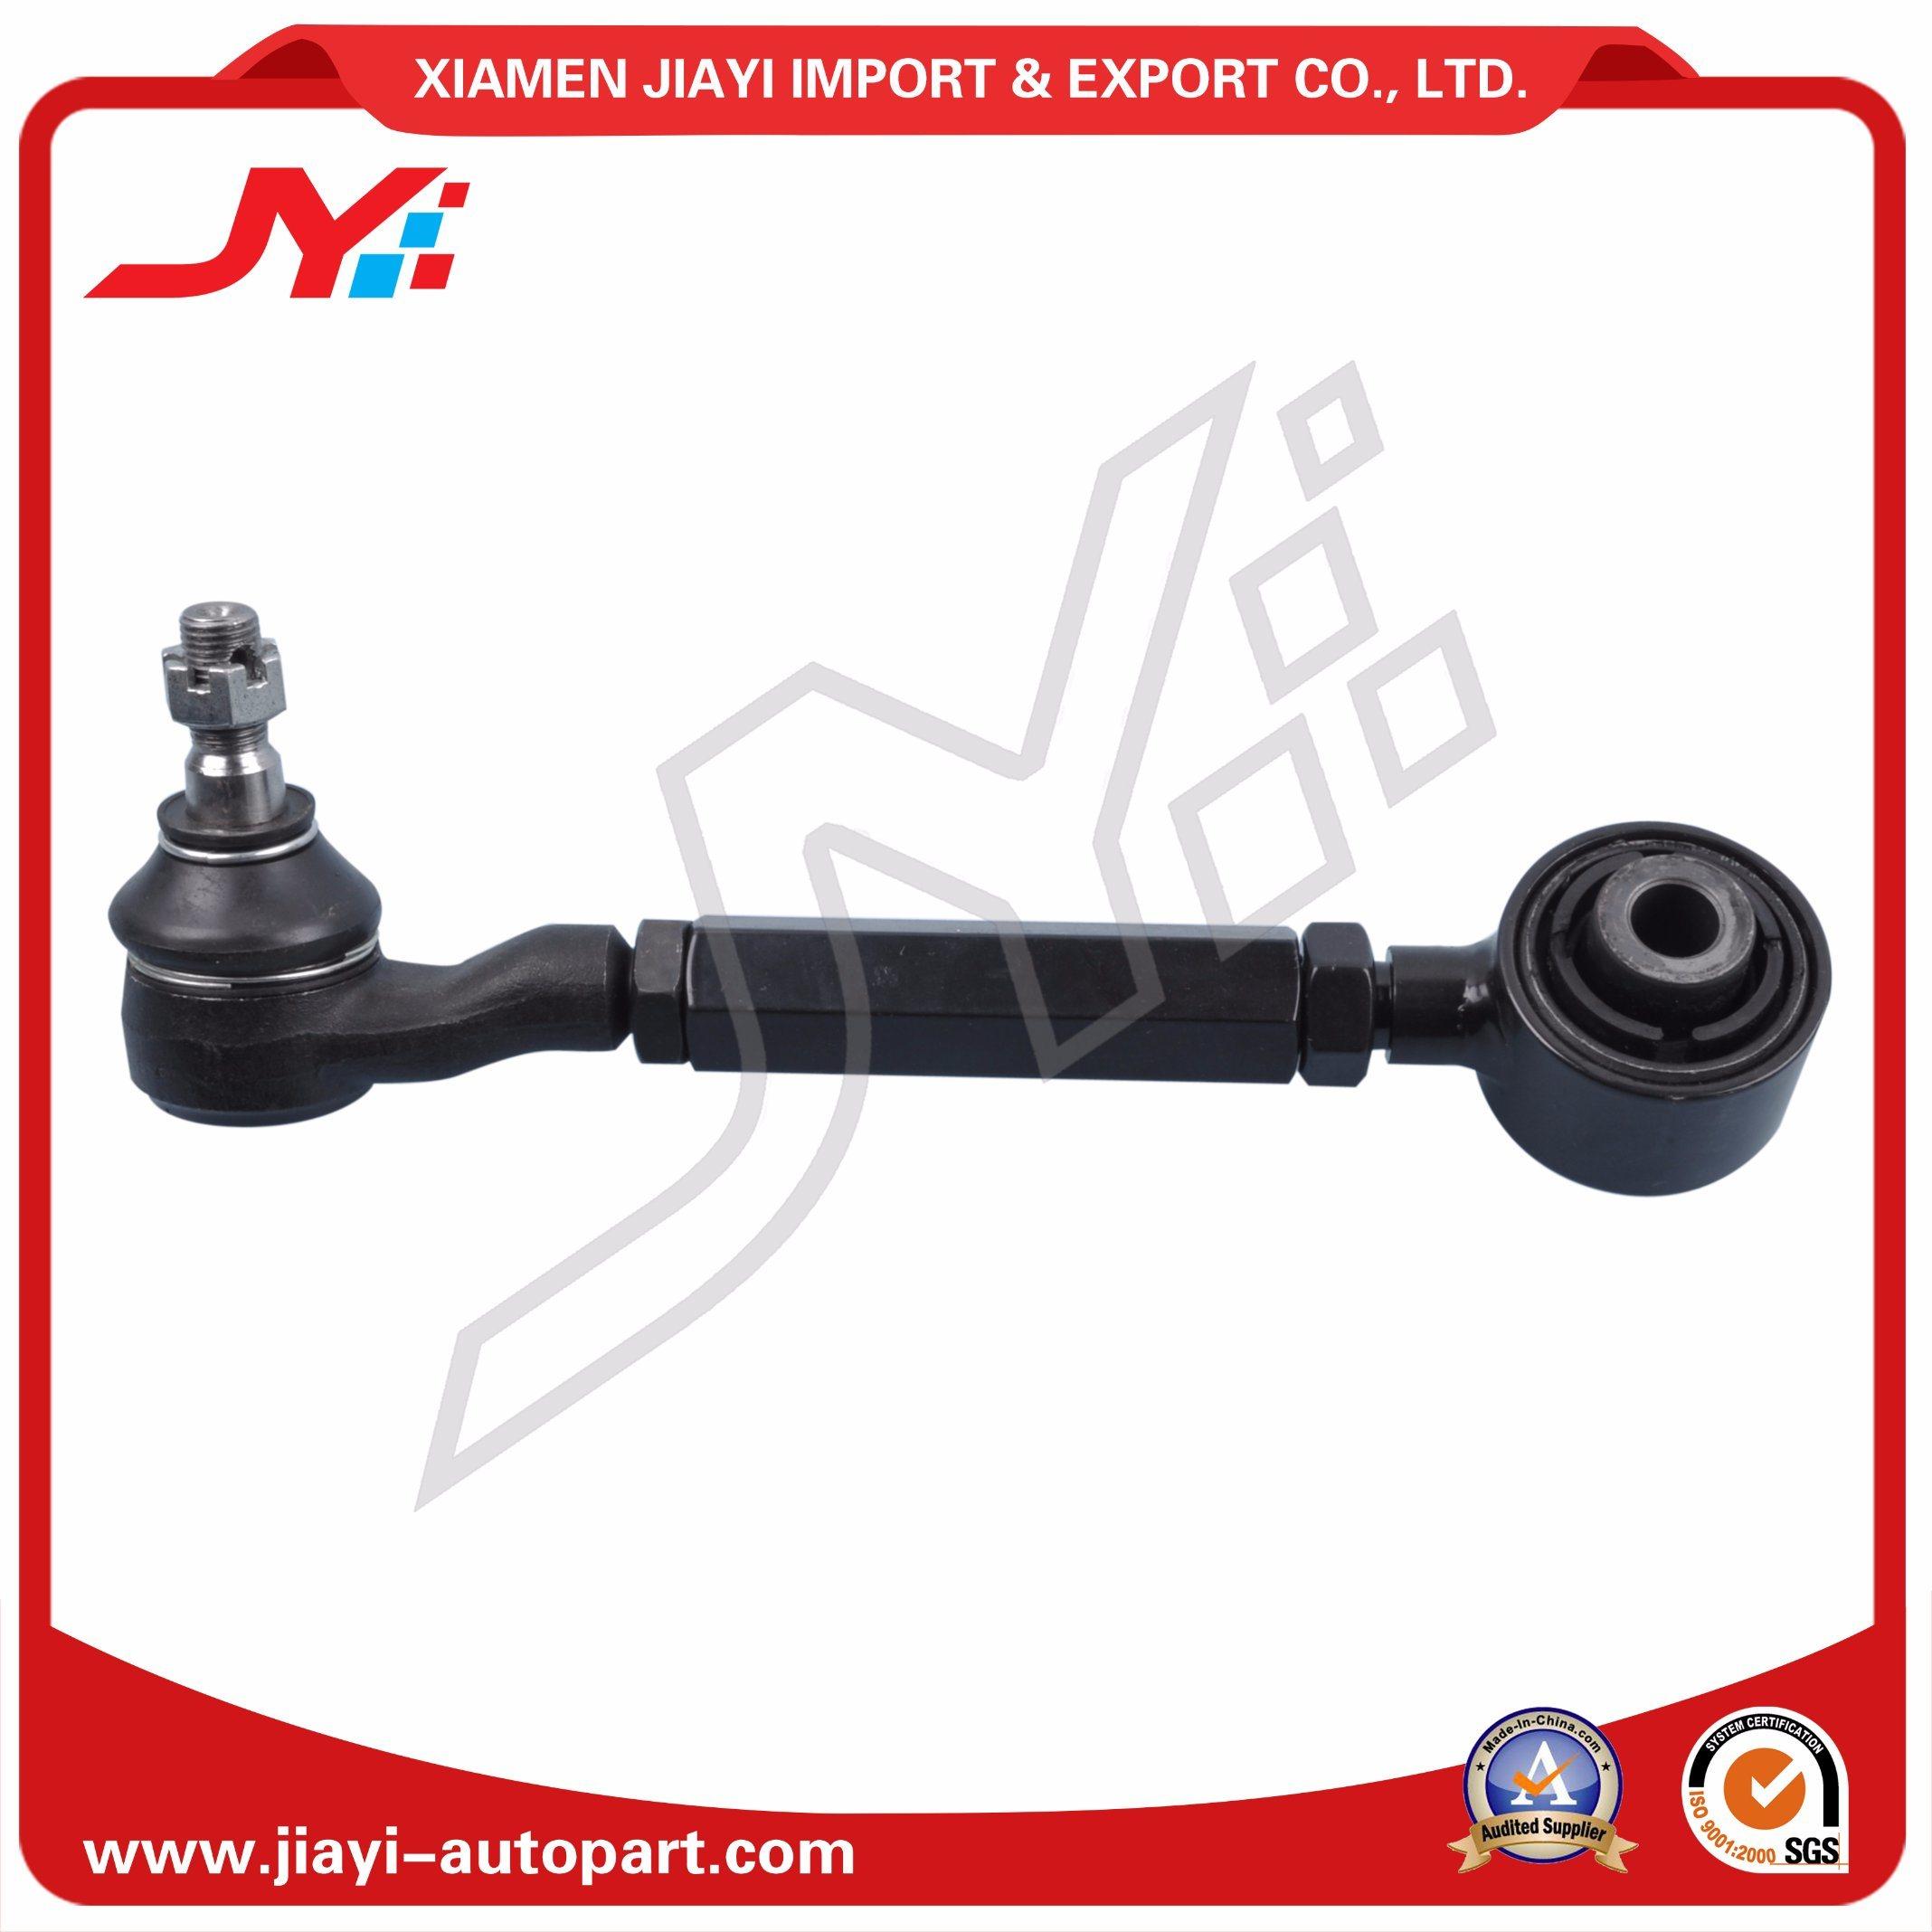 For Accord 03-07 Suspension Control Arm